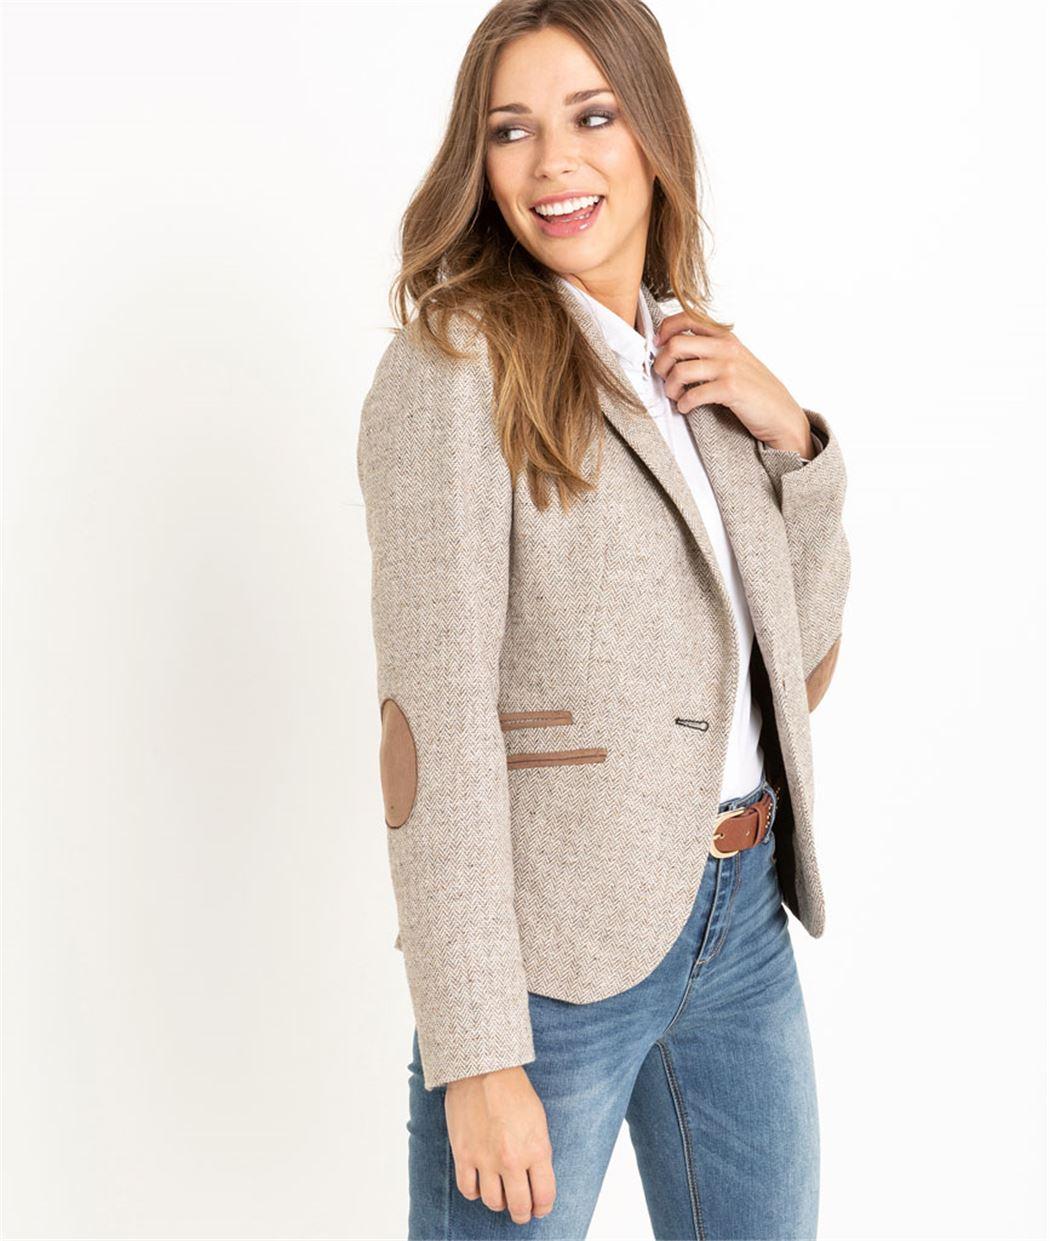 Veste tailleur femme en lainage beige BEIGE